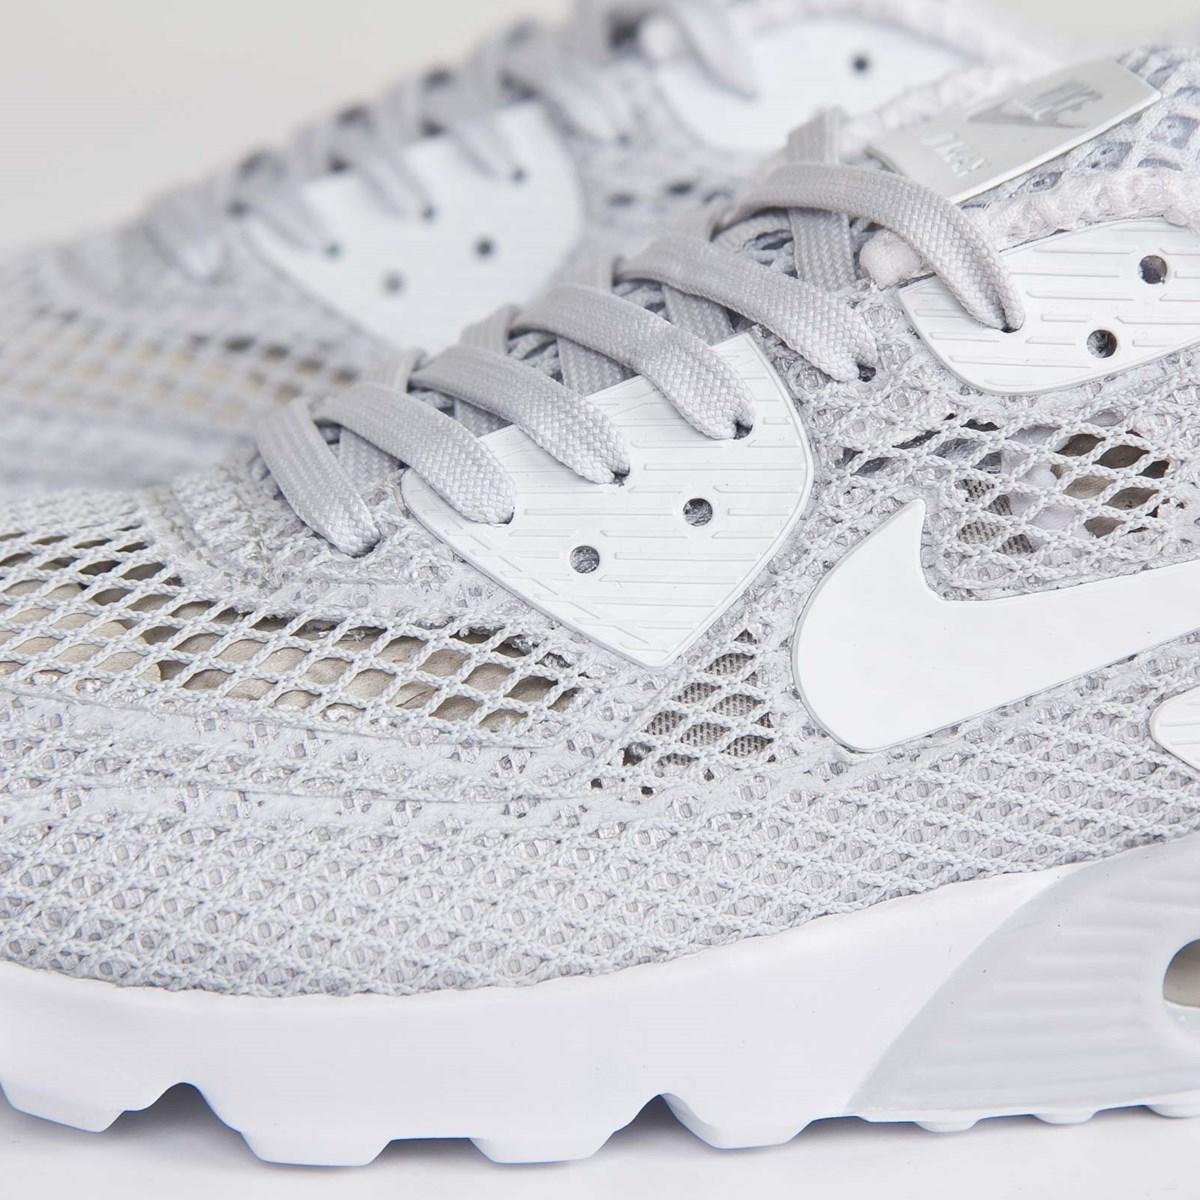 91719cb606 Nike Air Max 90 Ultra Br Plus QS - 810170-001 - Sneakersnstuff | sneakers &  streetwear online since 1999